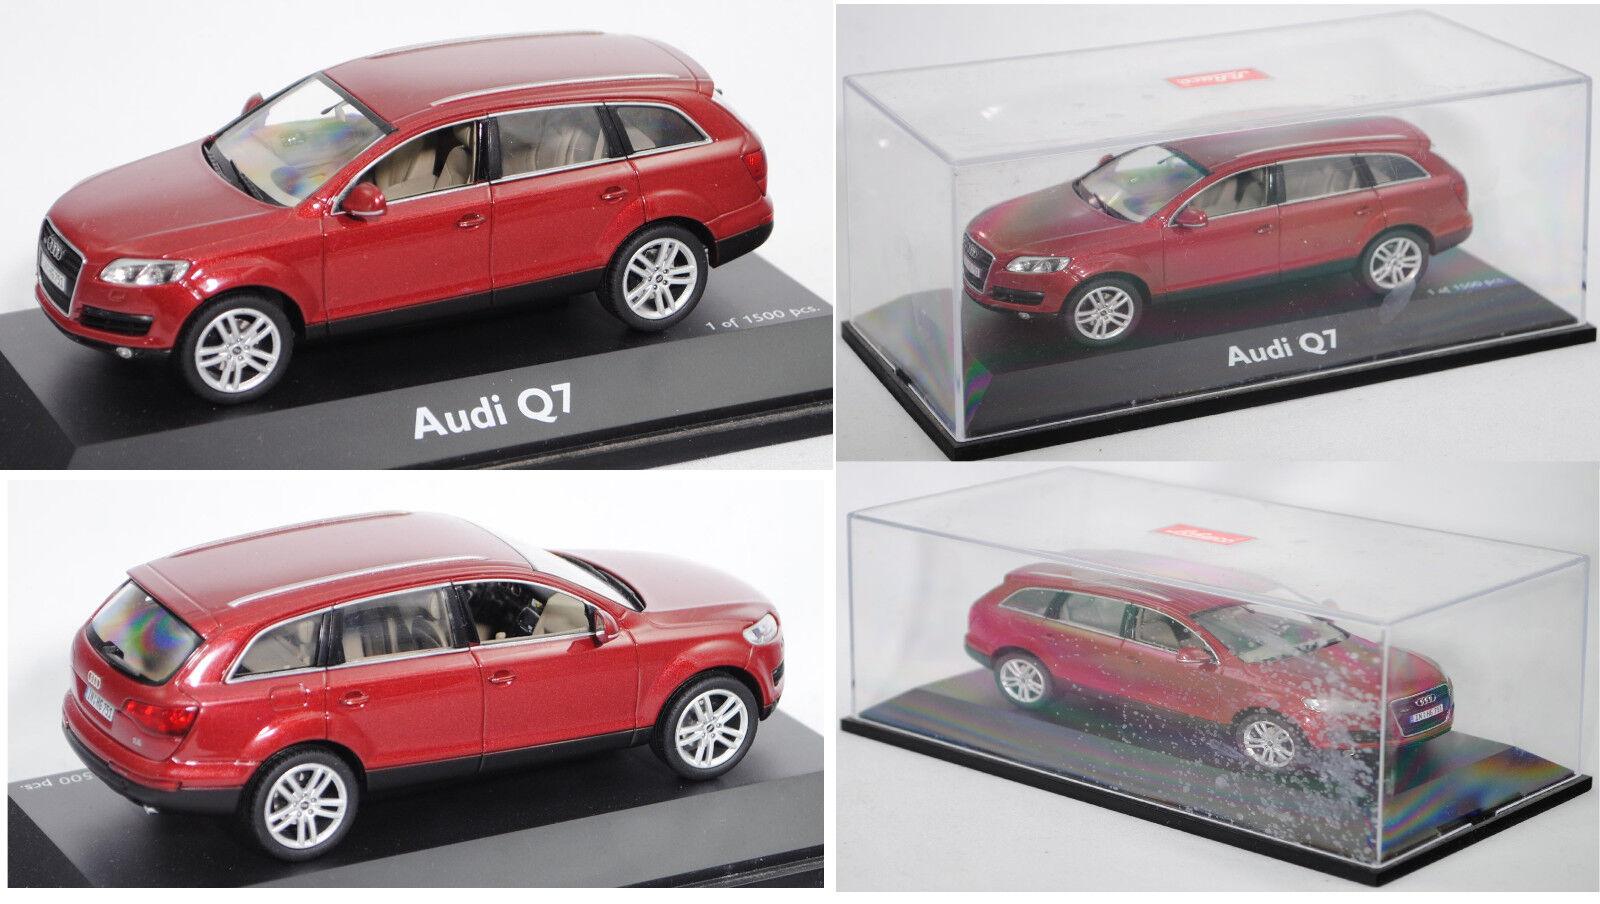 Schuco 450475100 Audi Q7 4.2 FSI quattro, granatred perleffekt, 1 43